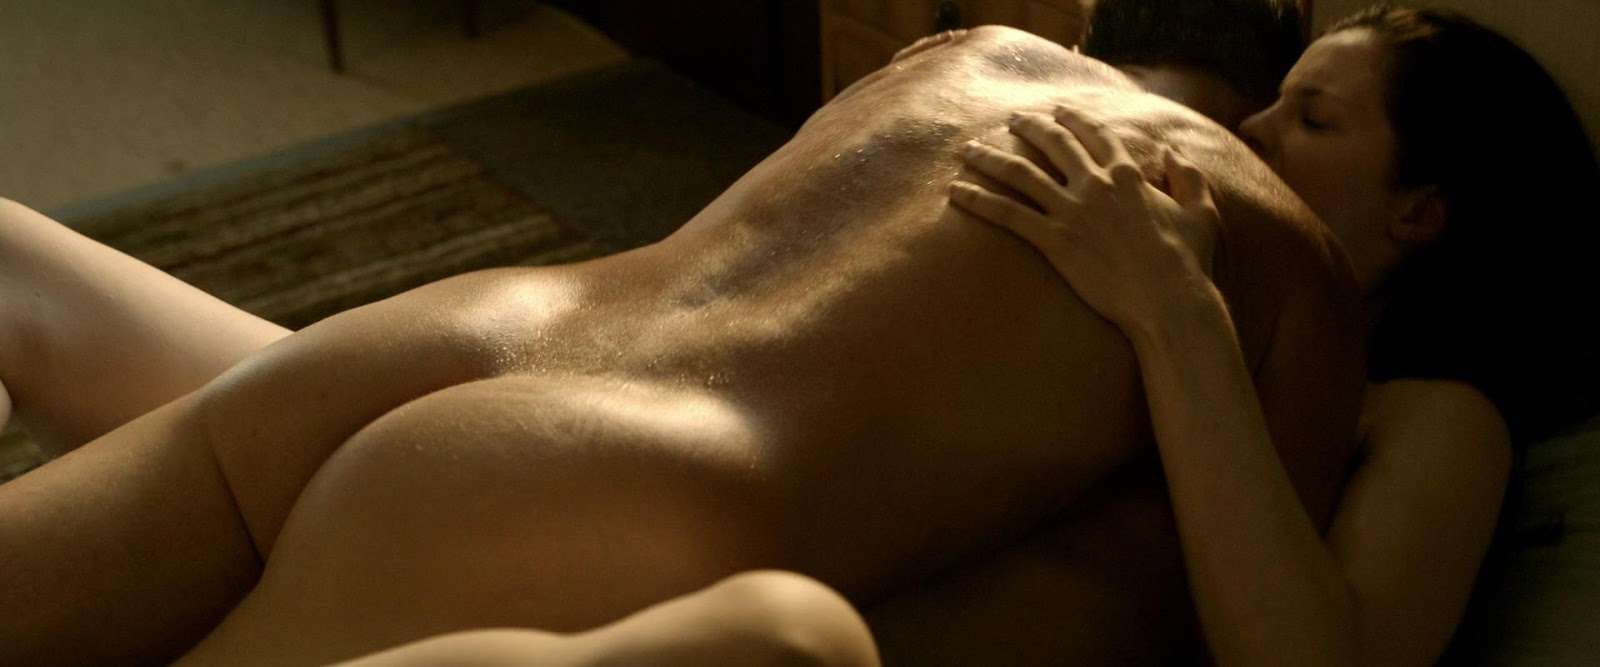 Nude background pics